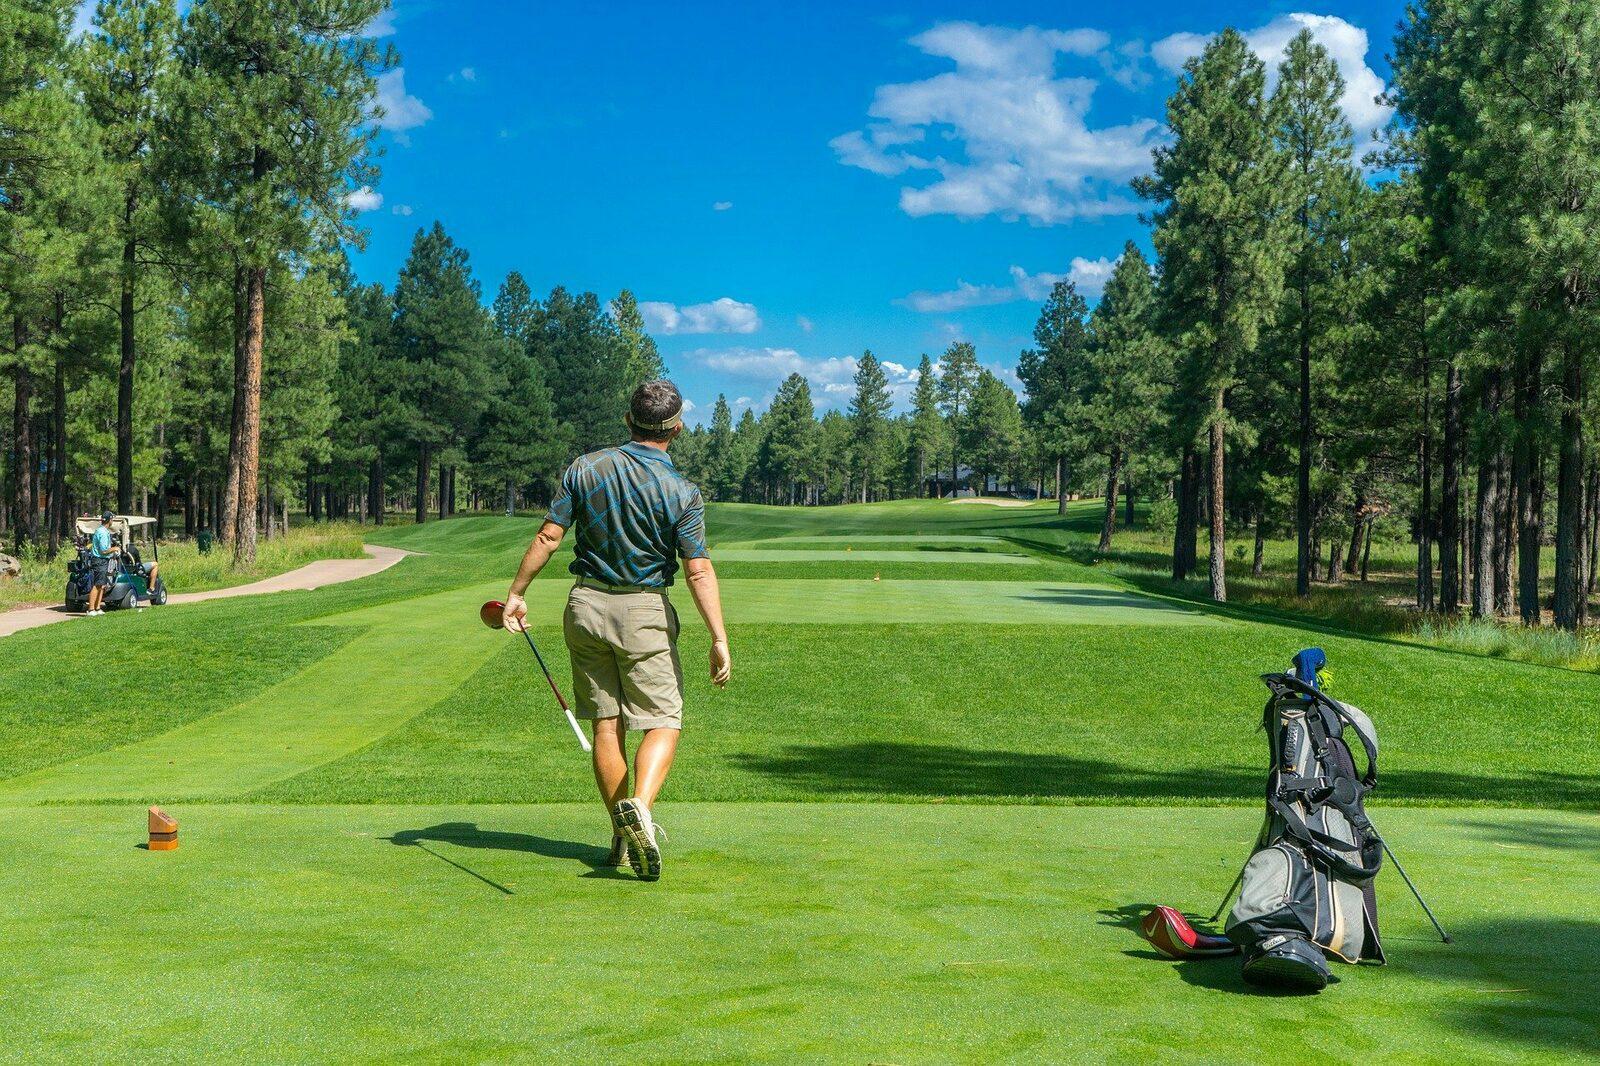 Golfer op de golfbaan